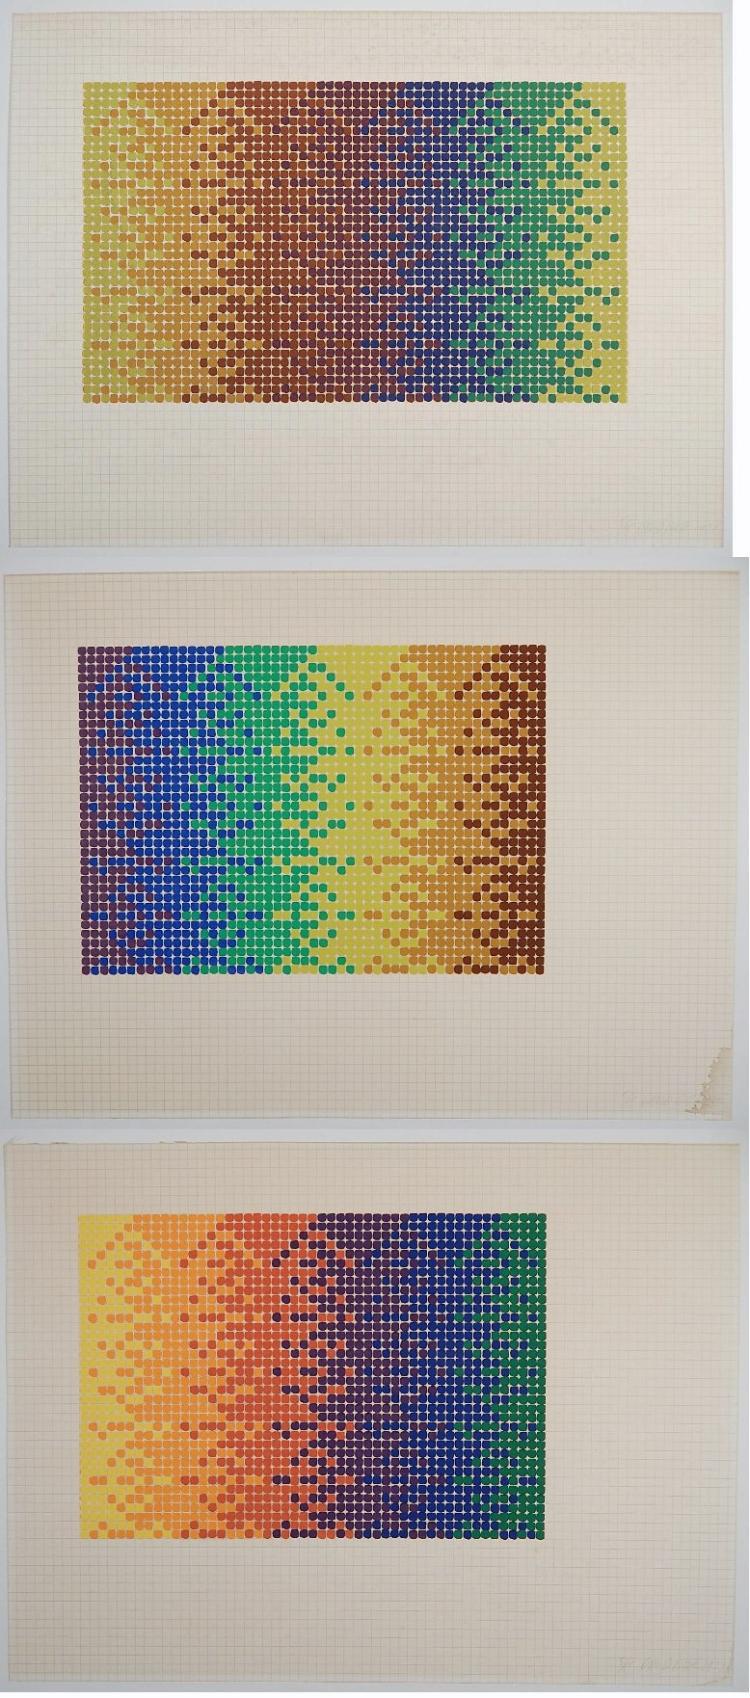 David Roth silkscreens